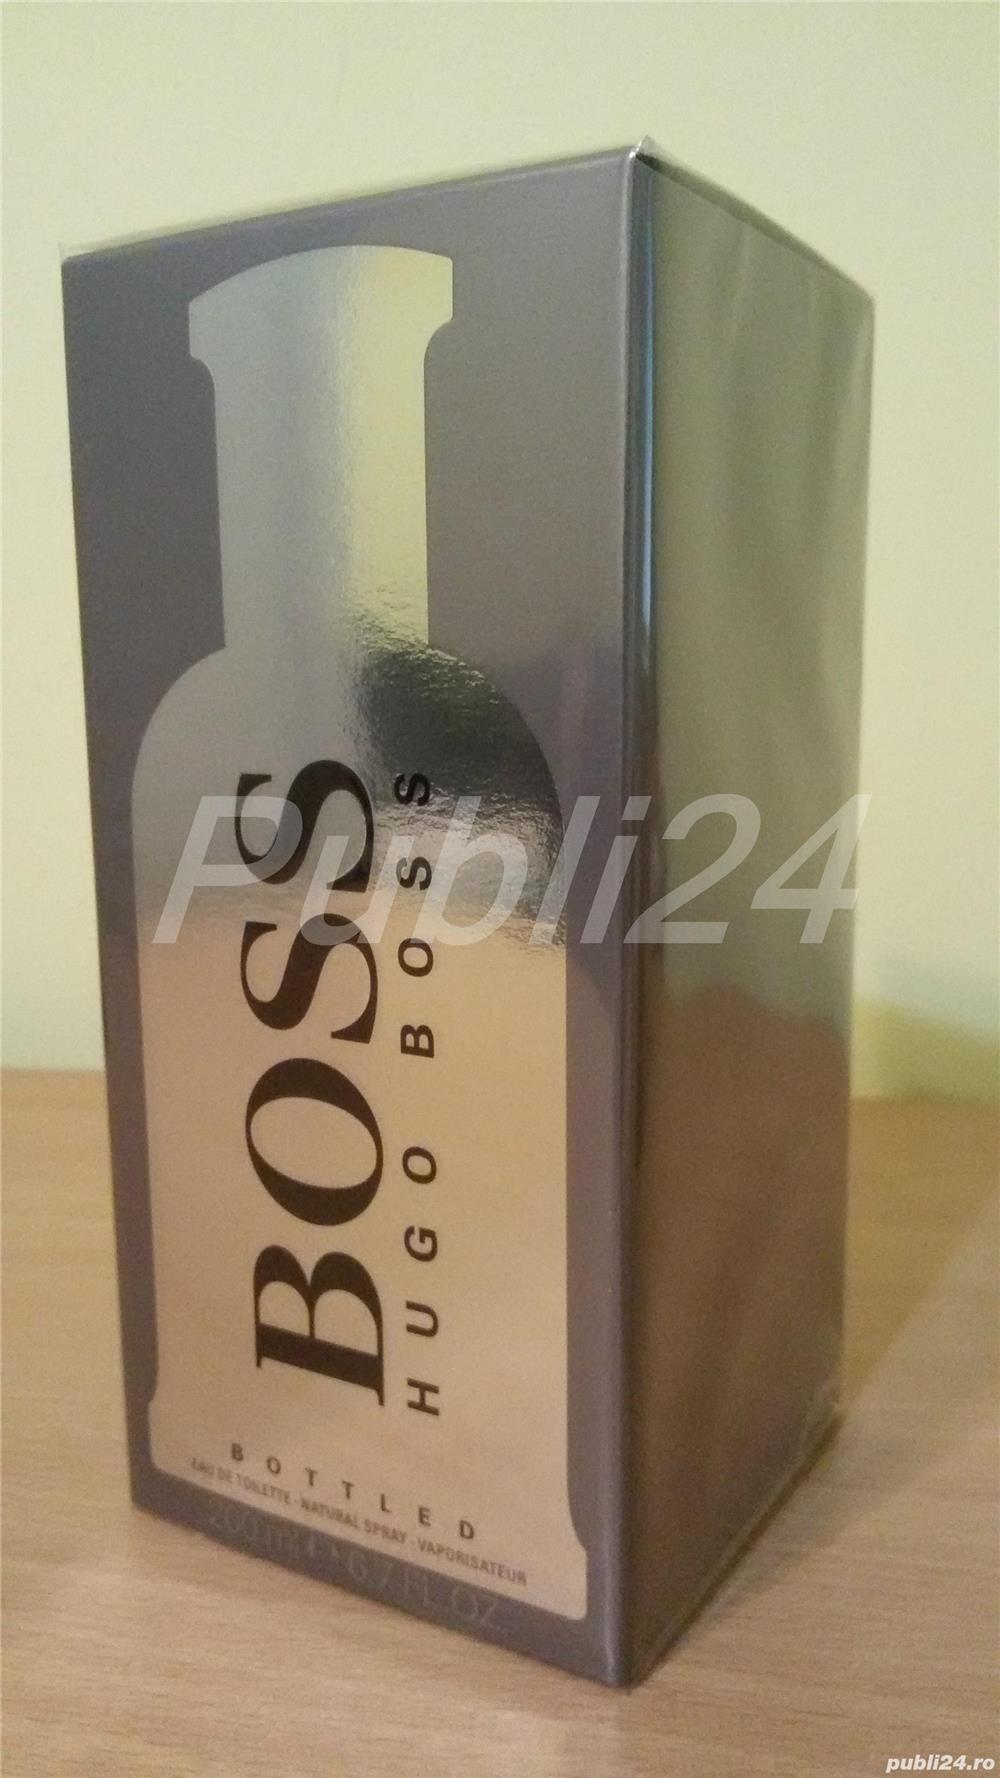 Vand parfum Boss Botled 200 ml - original Spania magazin Druni